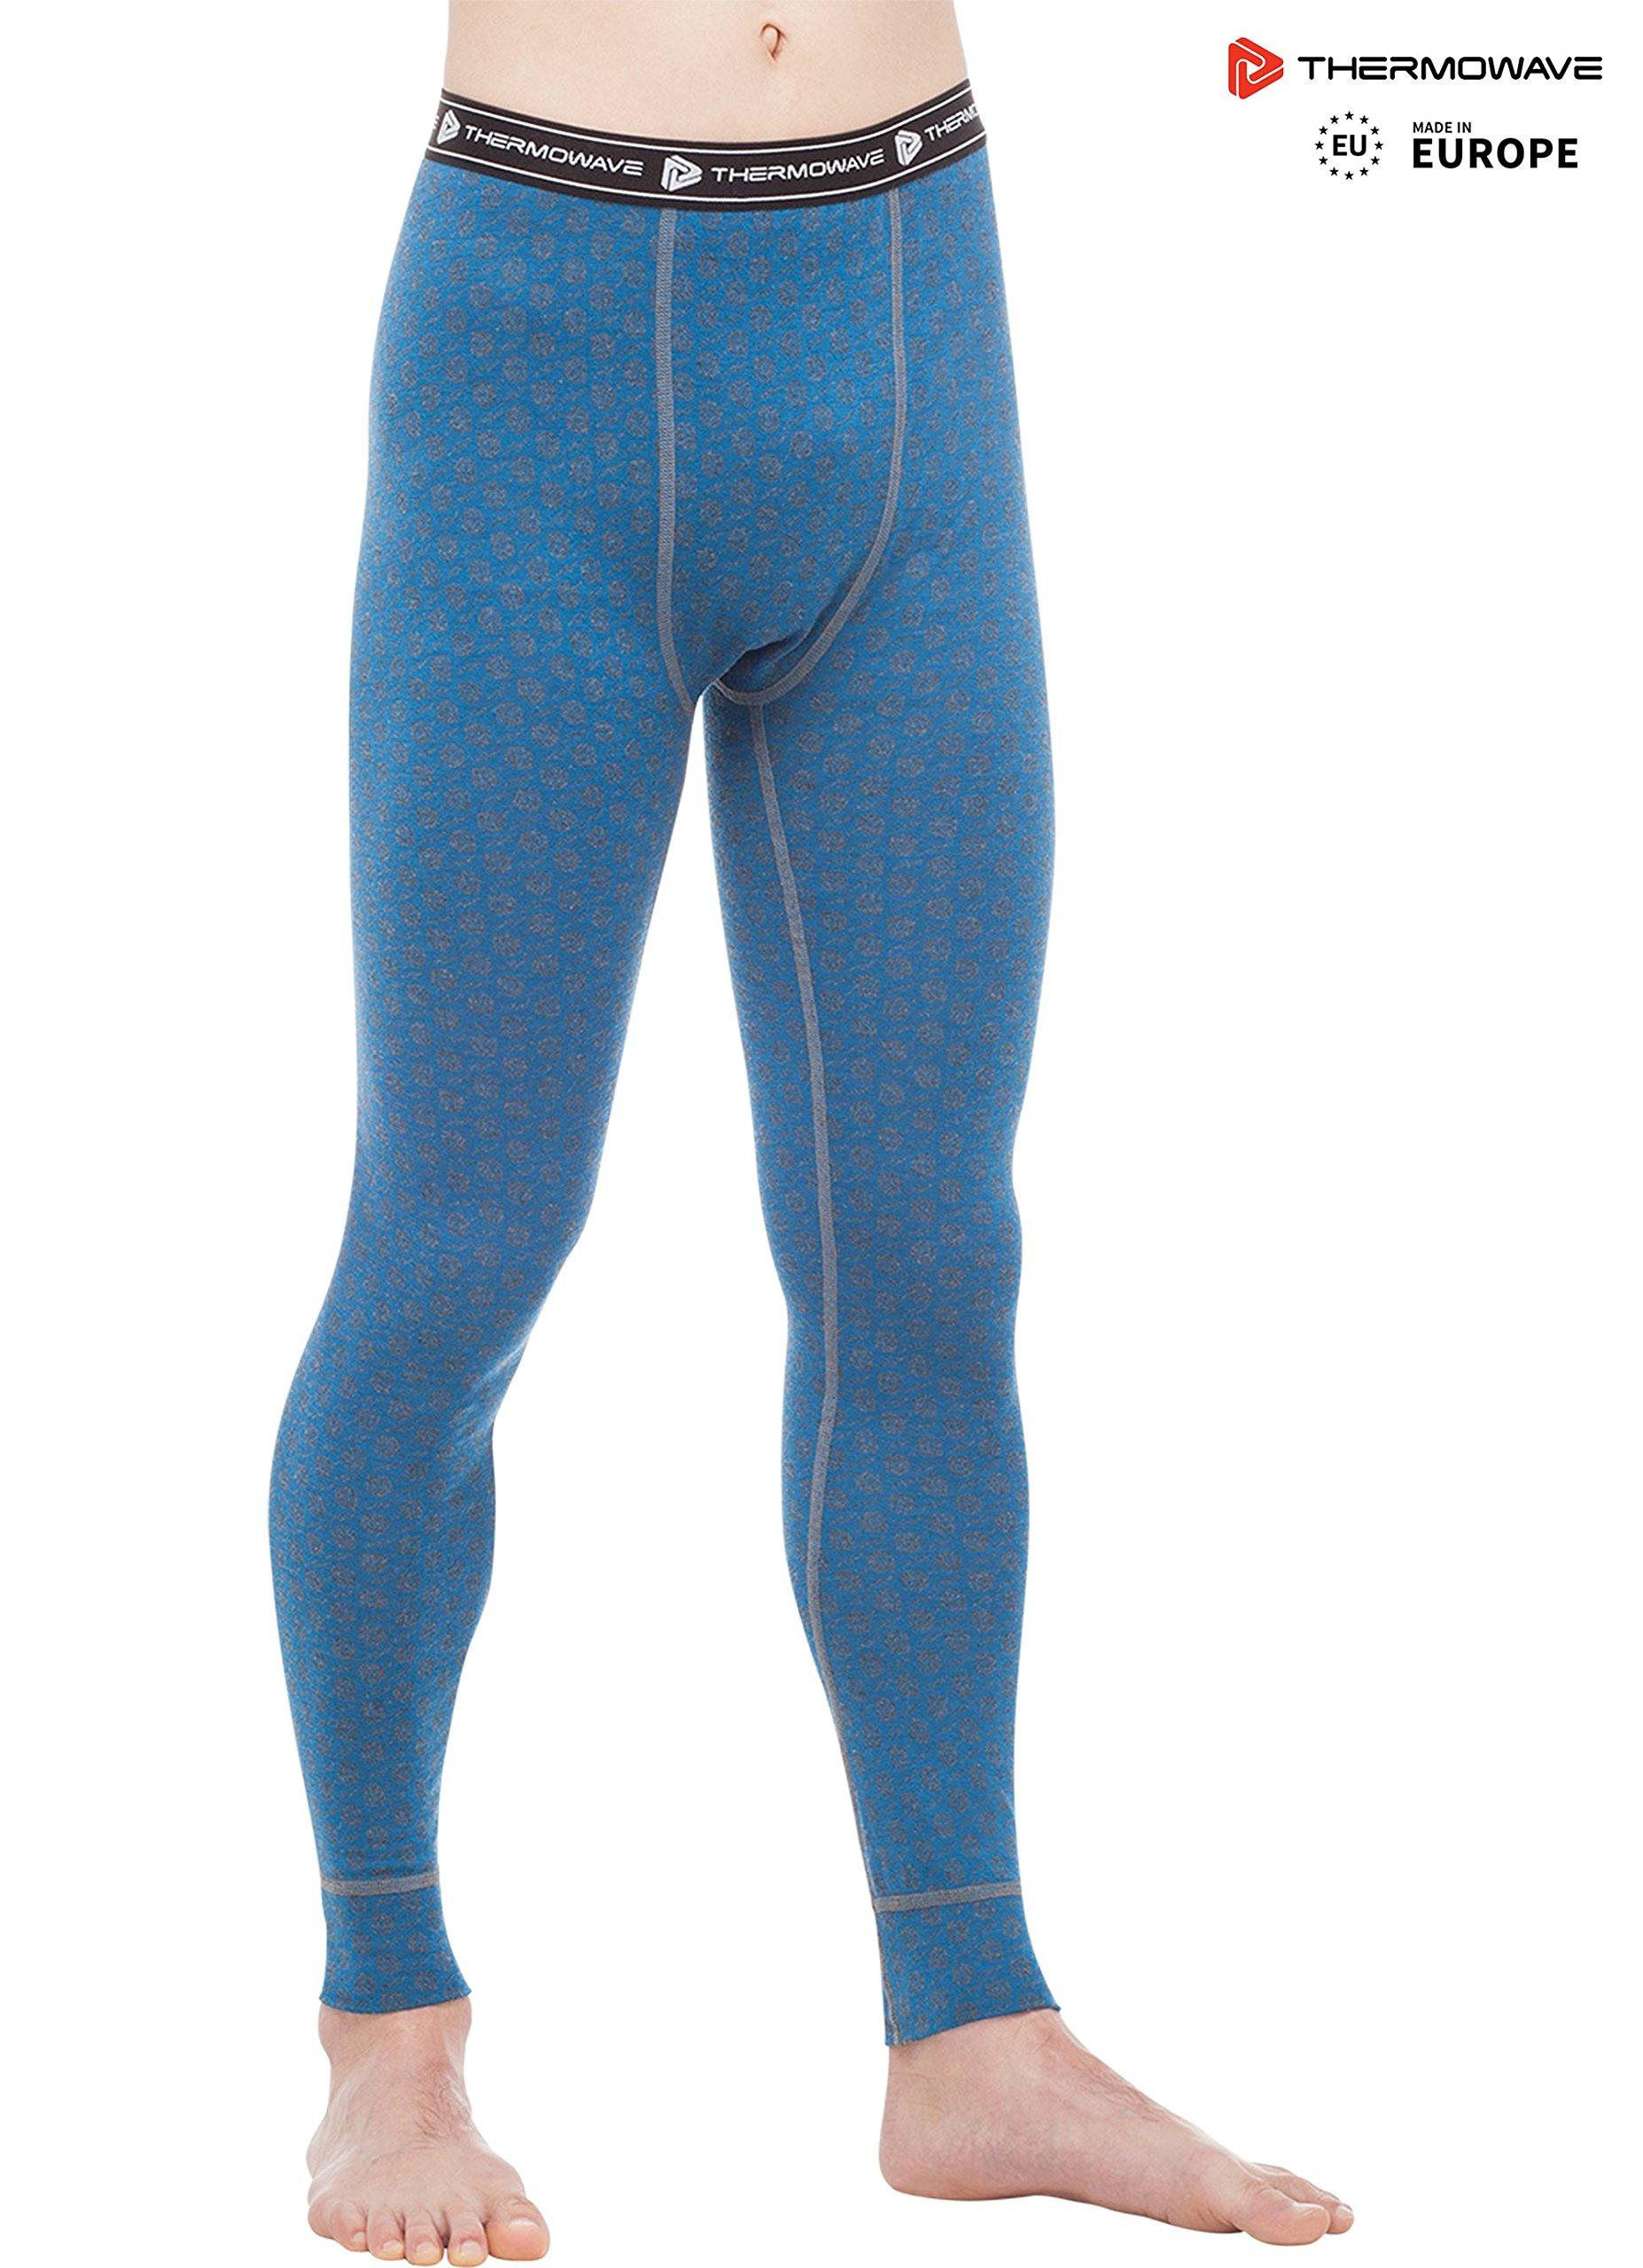 Thermowave - Merino Xtreme/Mens Merino Wool Thermal Pants/Dark SEA - L